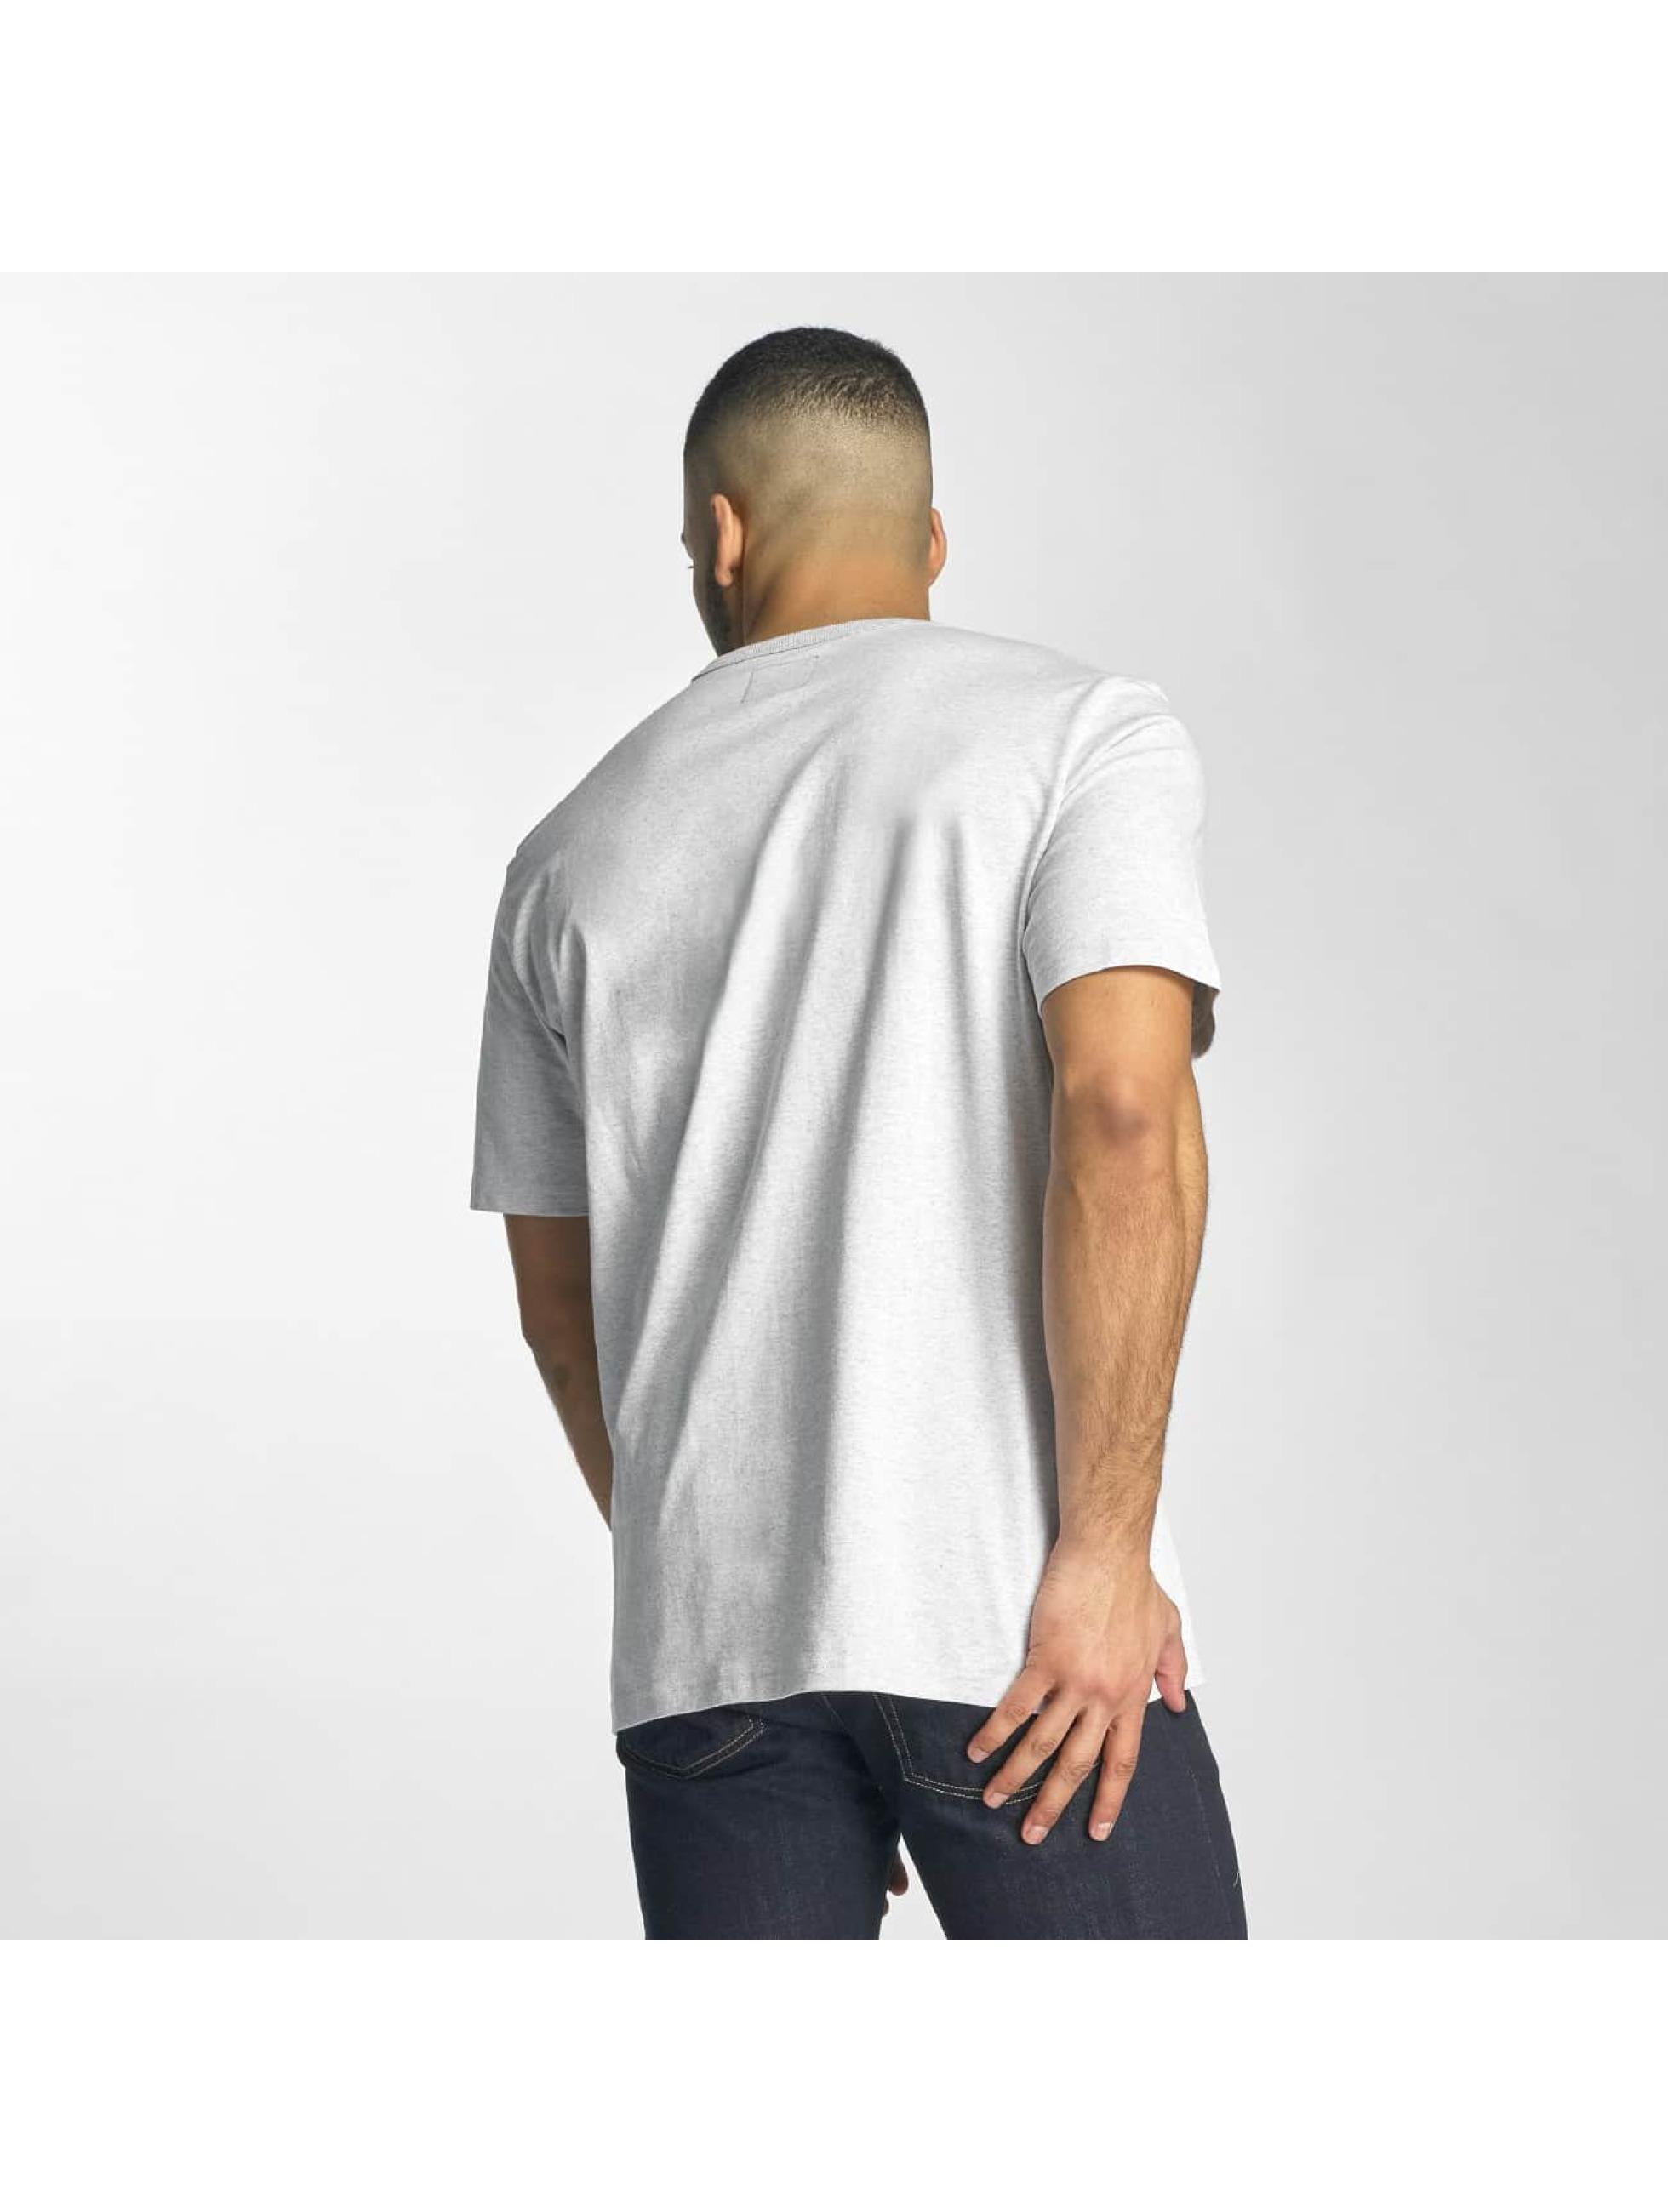 Carhartt WIP T-Shirt S/S CA Training beige